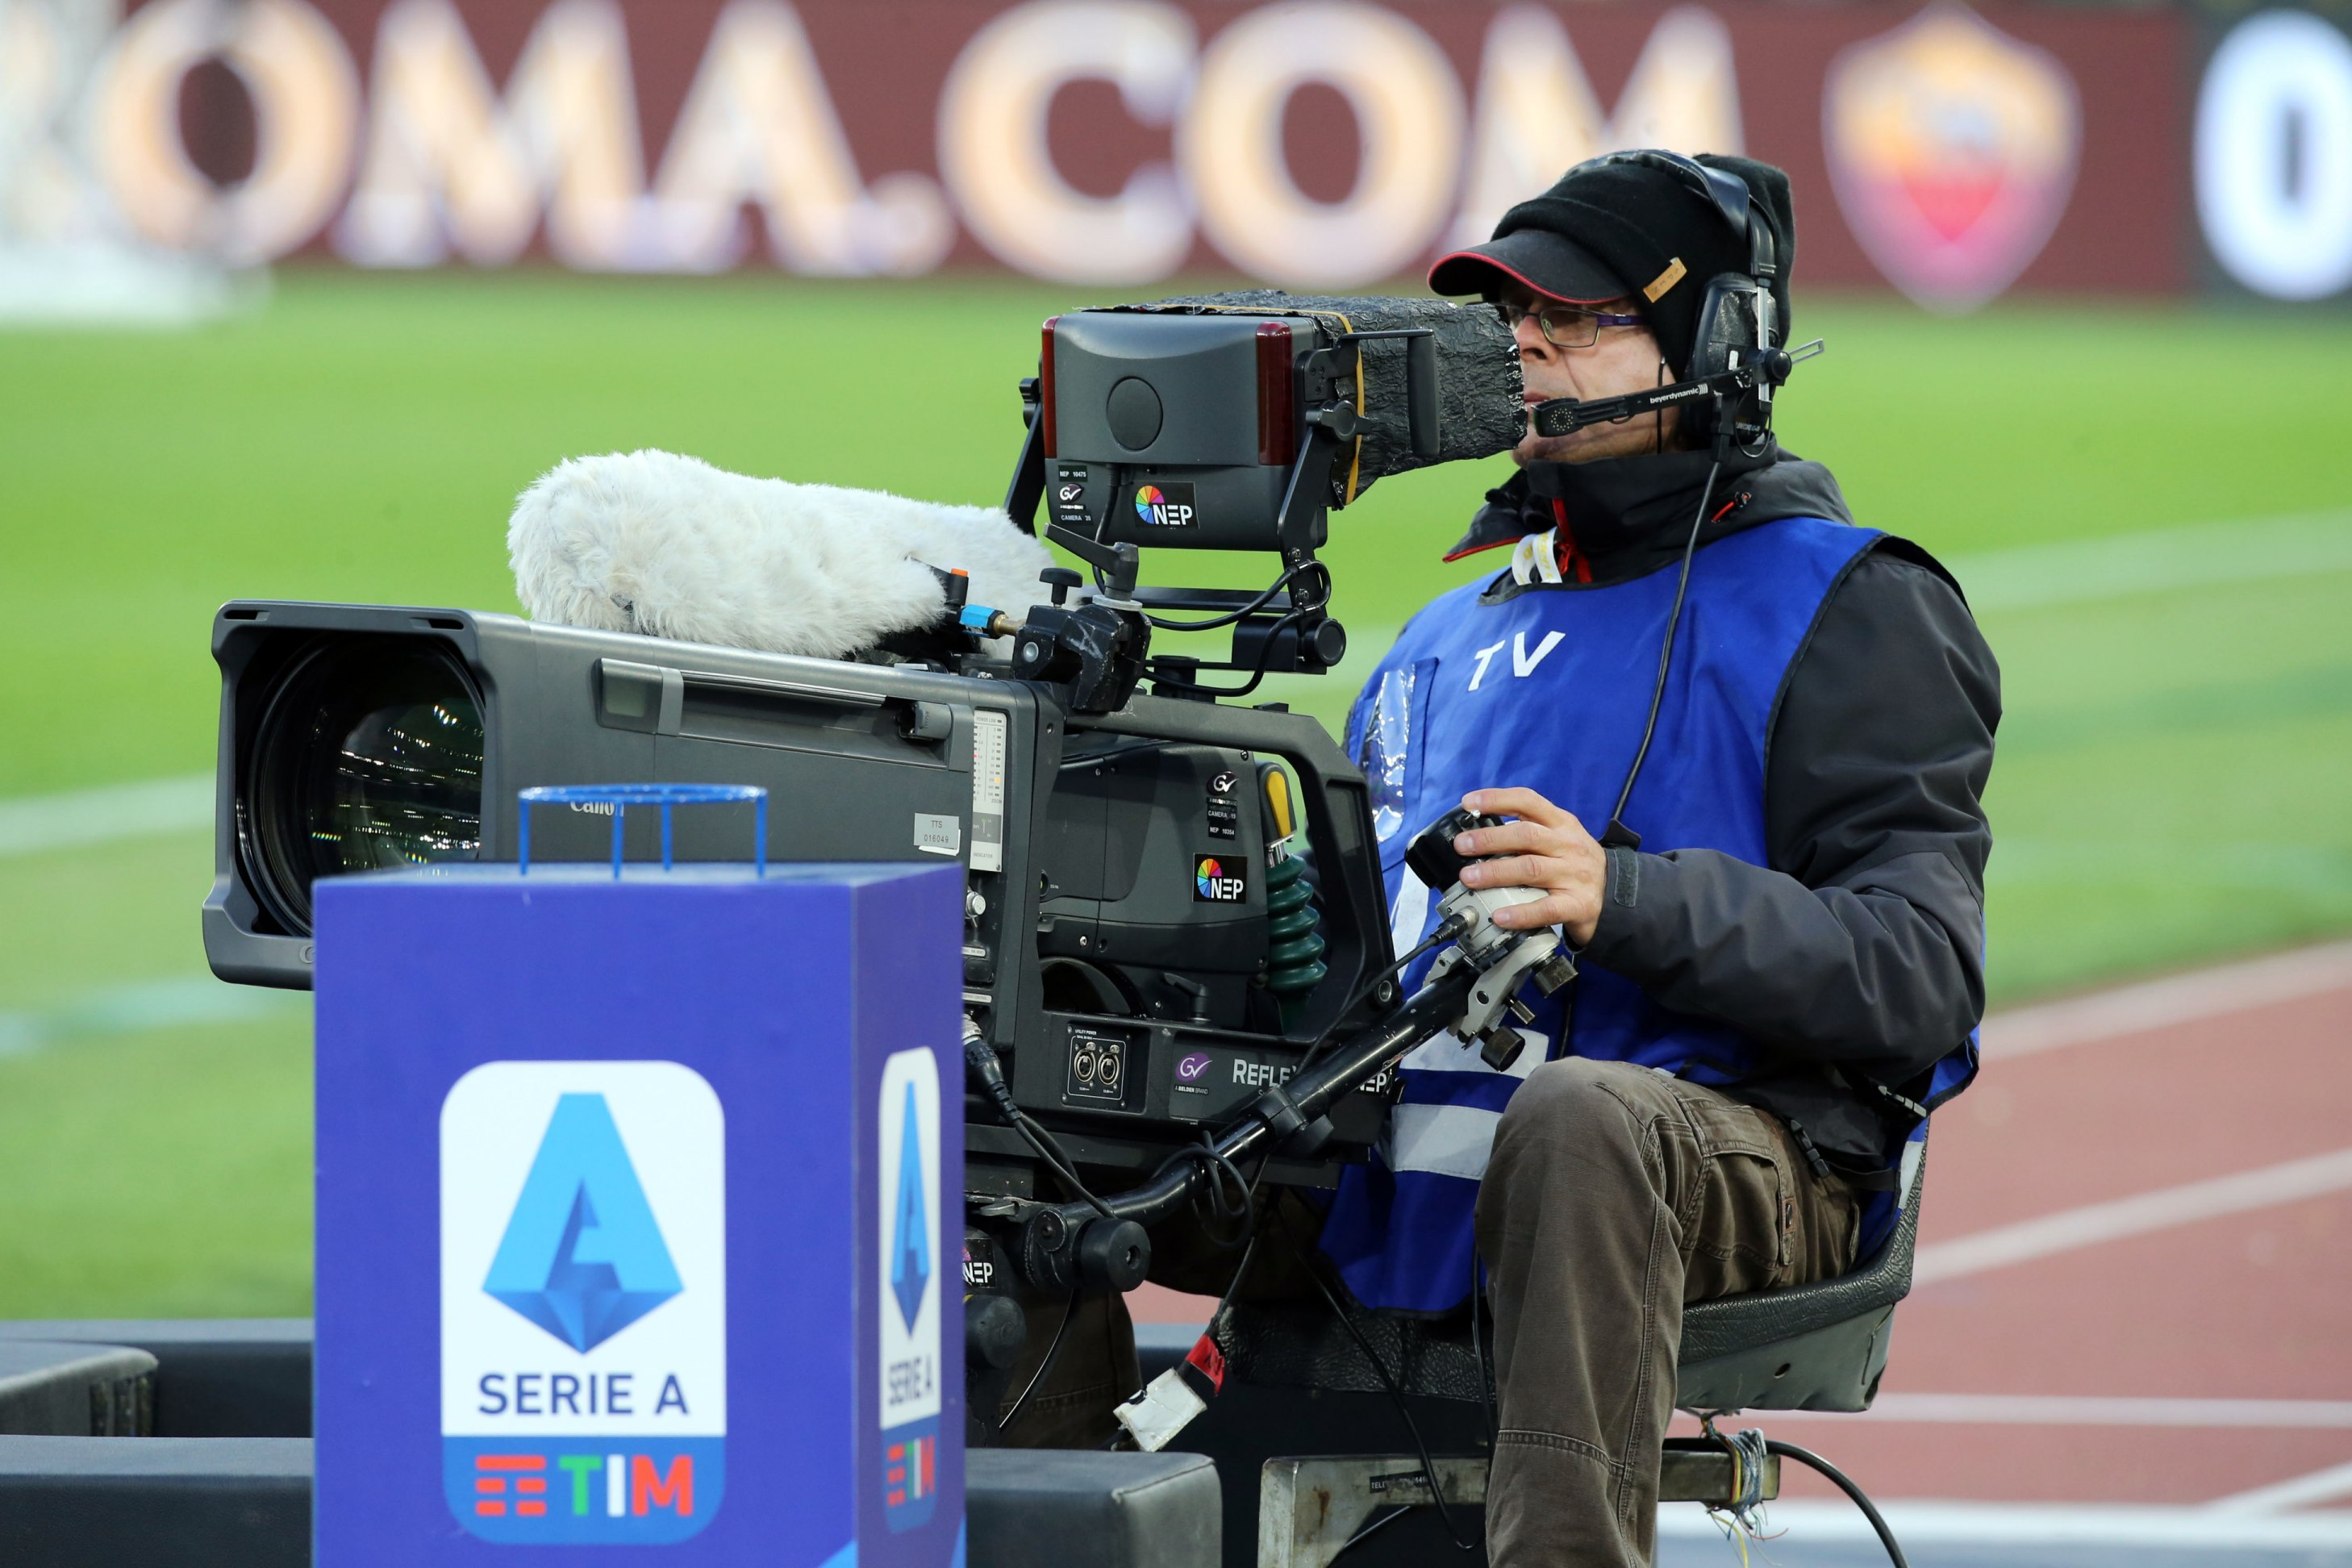 Coronavirus, 5 gare a porte chiuse in Serie A (Juventus-Inter) e date recuperi